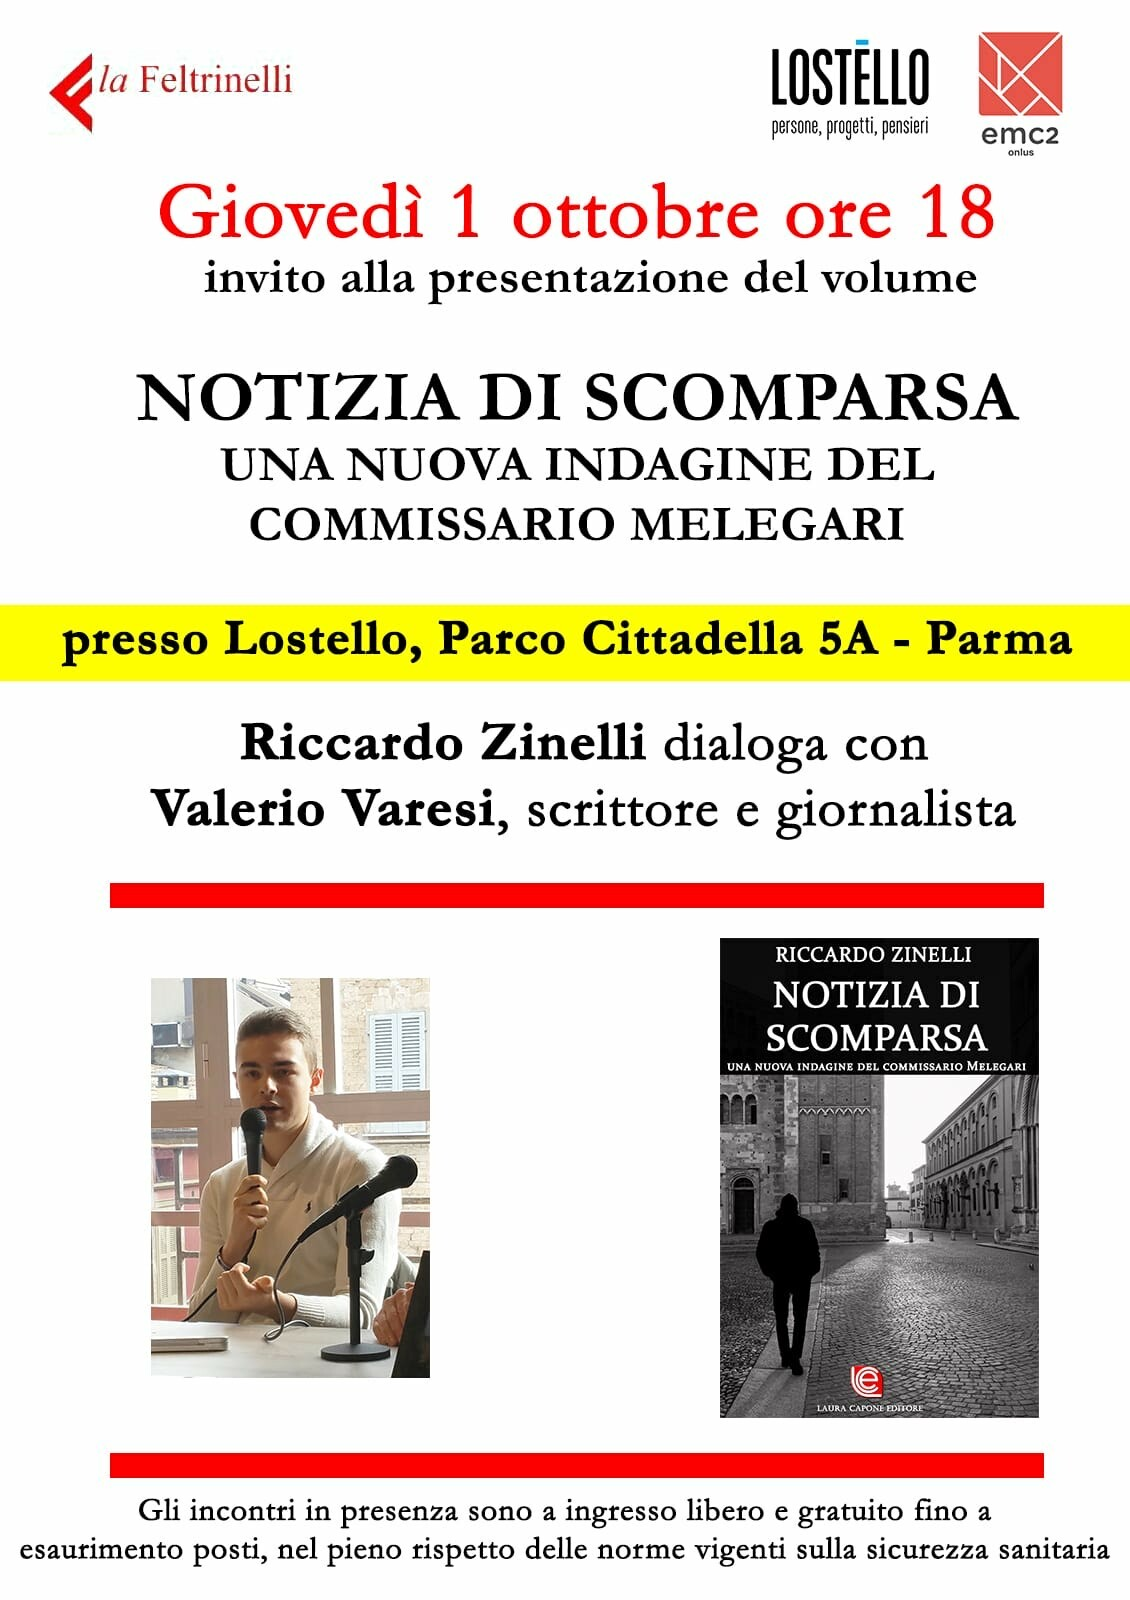 Riccardo Zinelli dialoga con Valerio Varesi